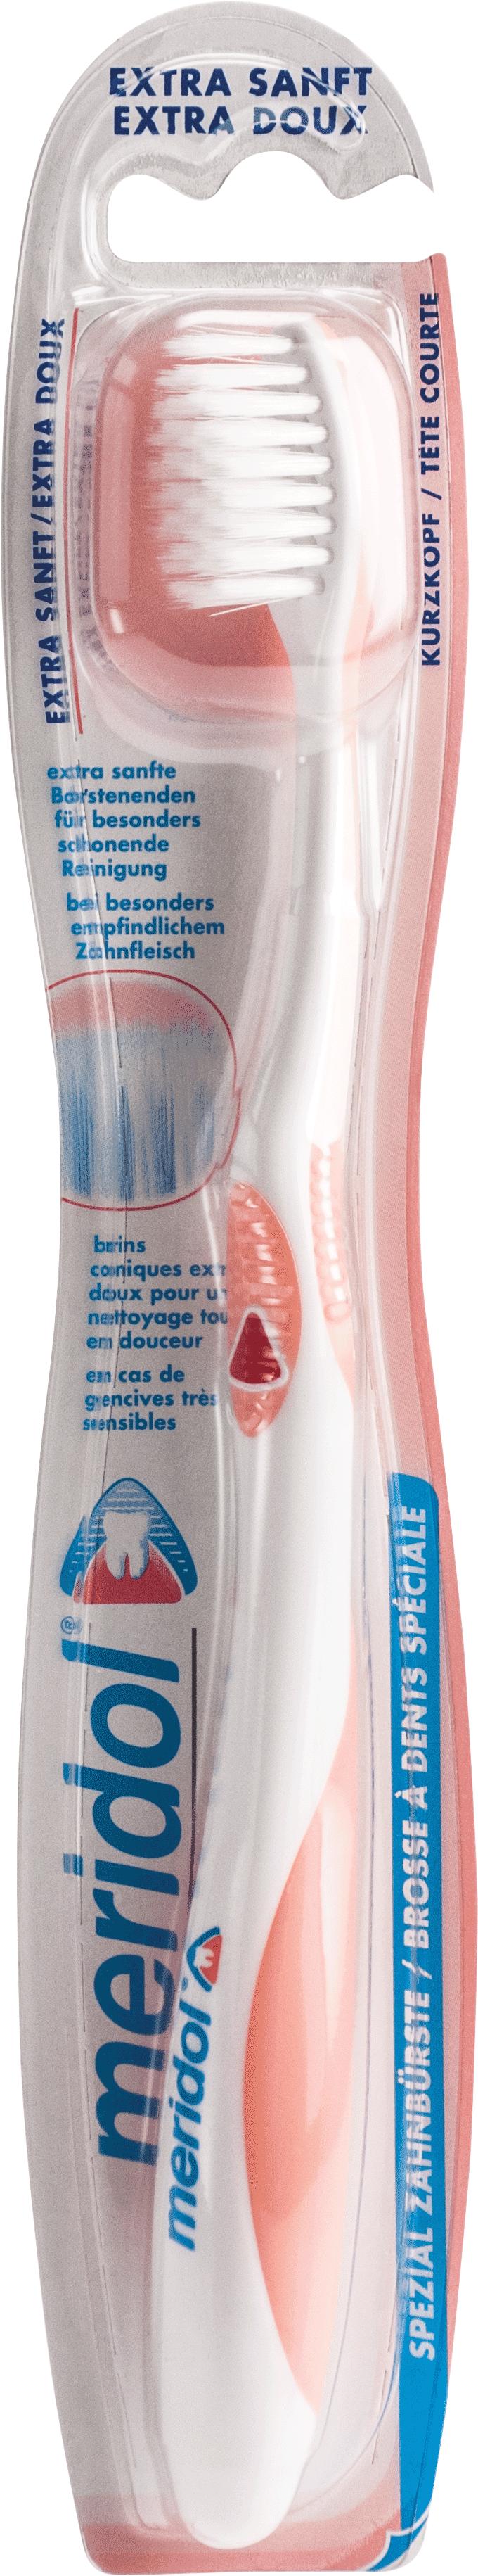 meridol Spezial-Zahnbürste